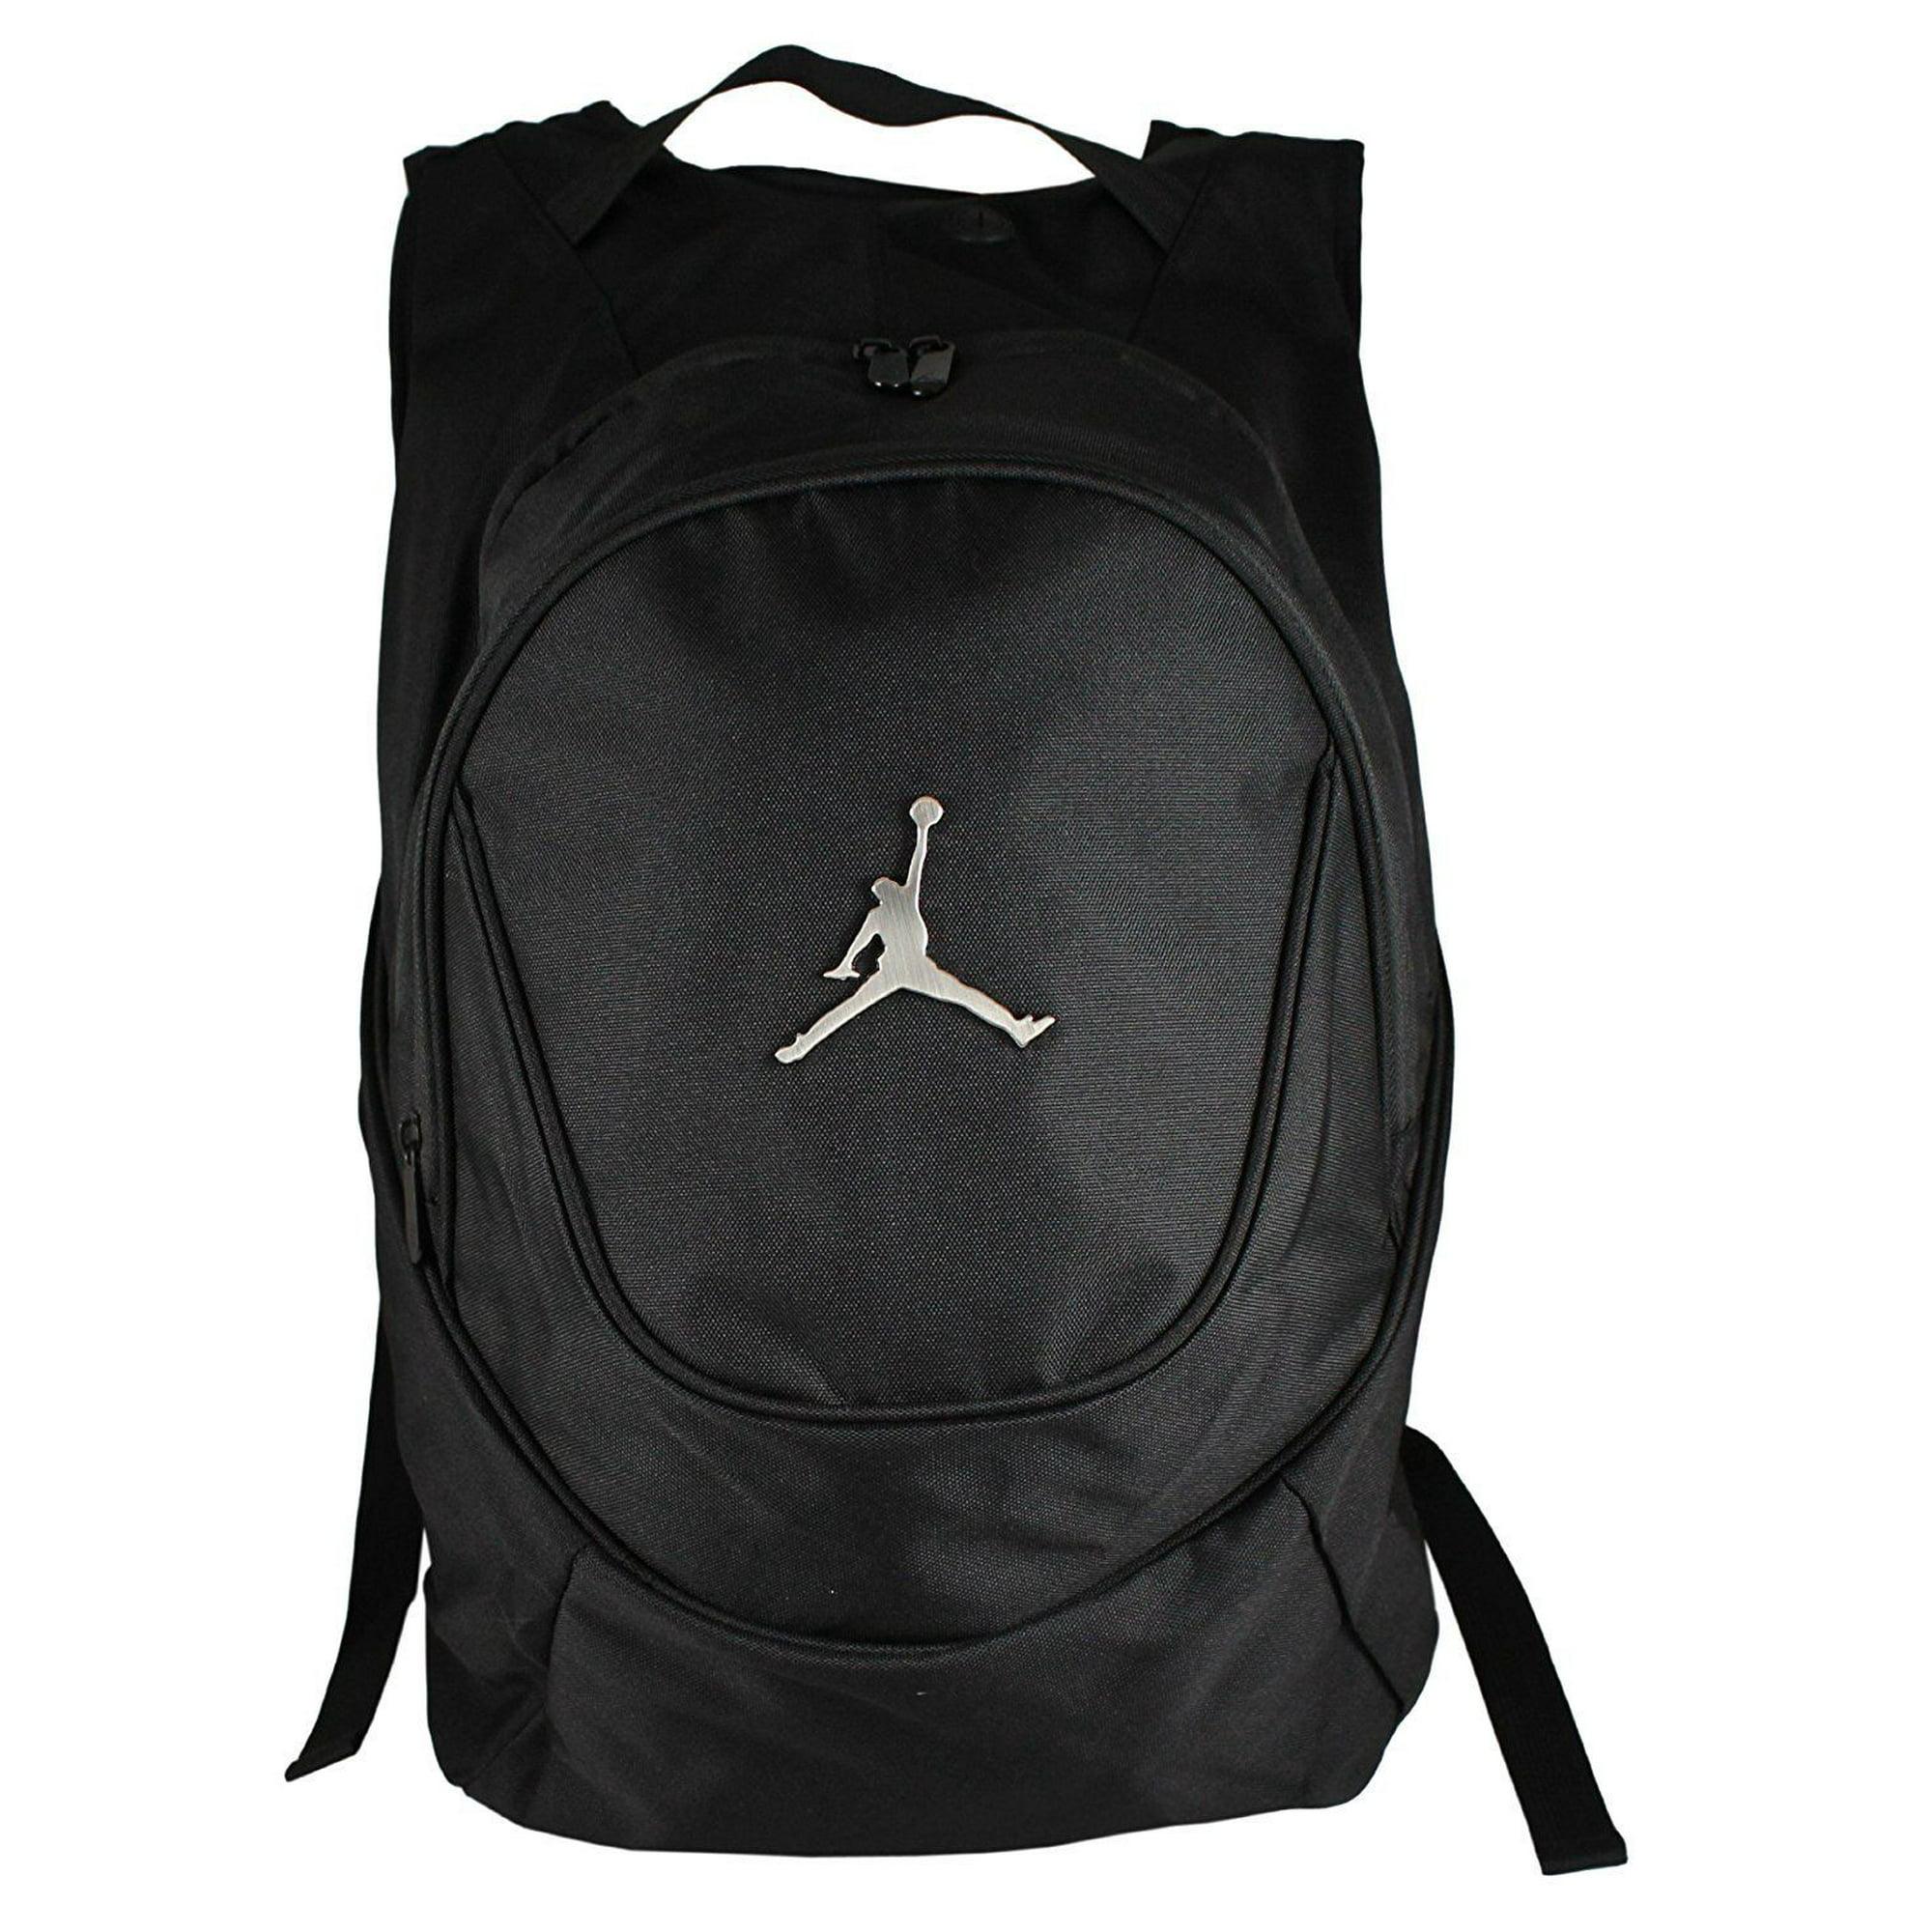 512d9f1f8fdd84 Buy Nike Jordan Jumpman 23 Round Shell Style Backpack - Black ...